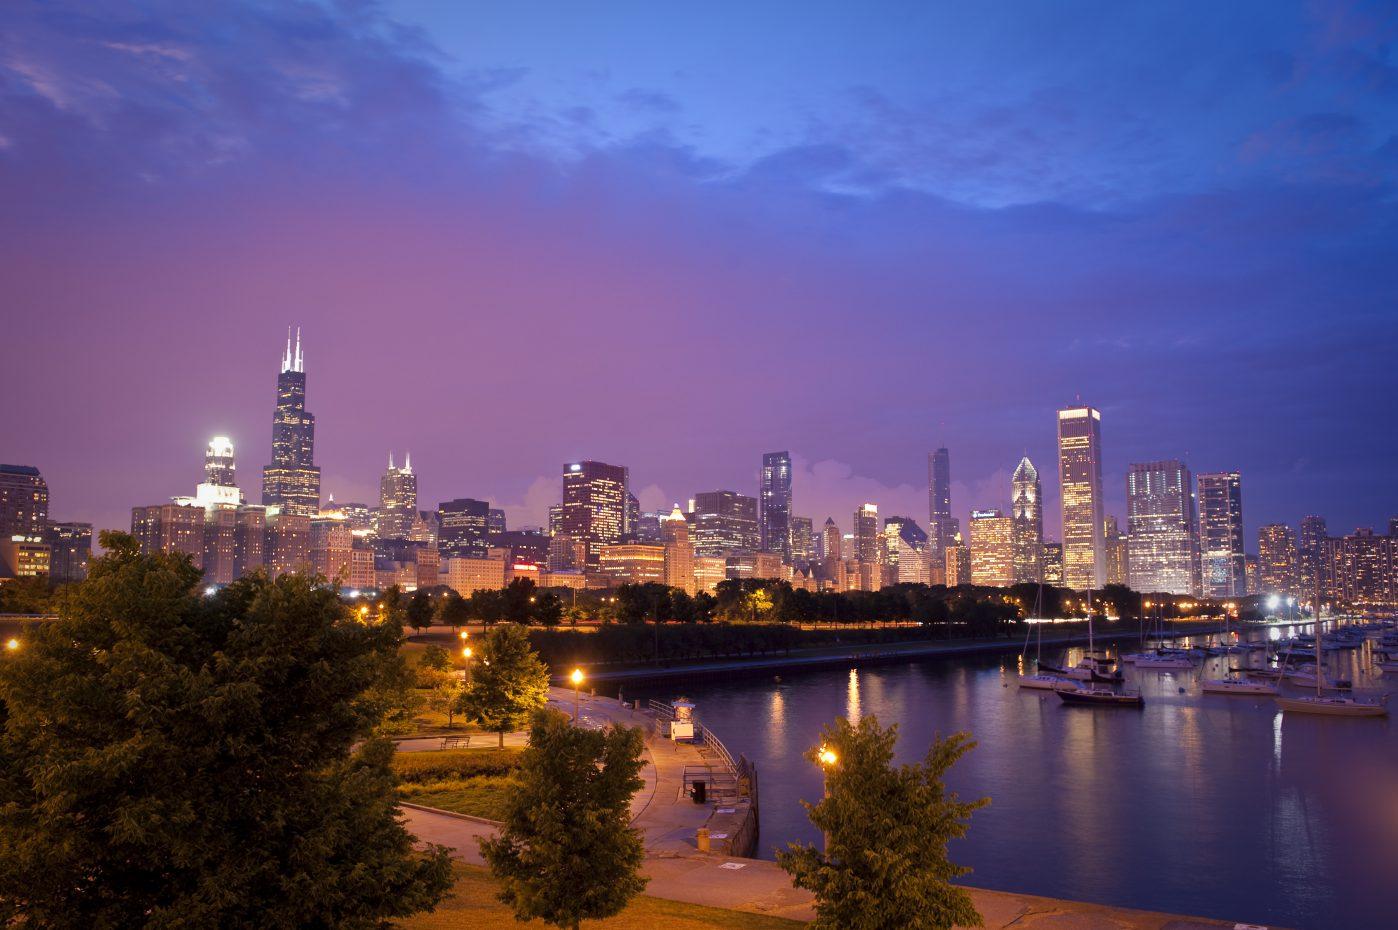 CITY_Chicago_CityLights_Harbor-1-e1565103459409